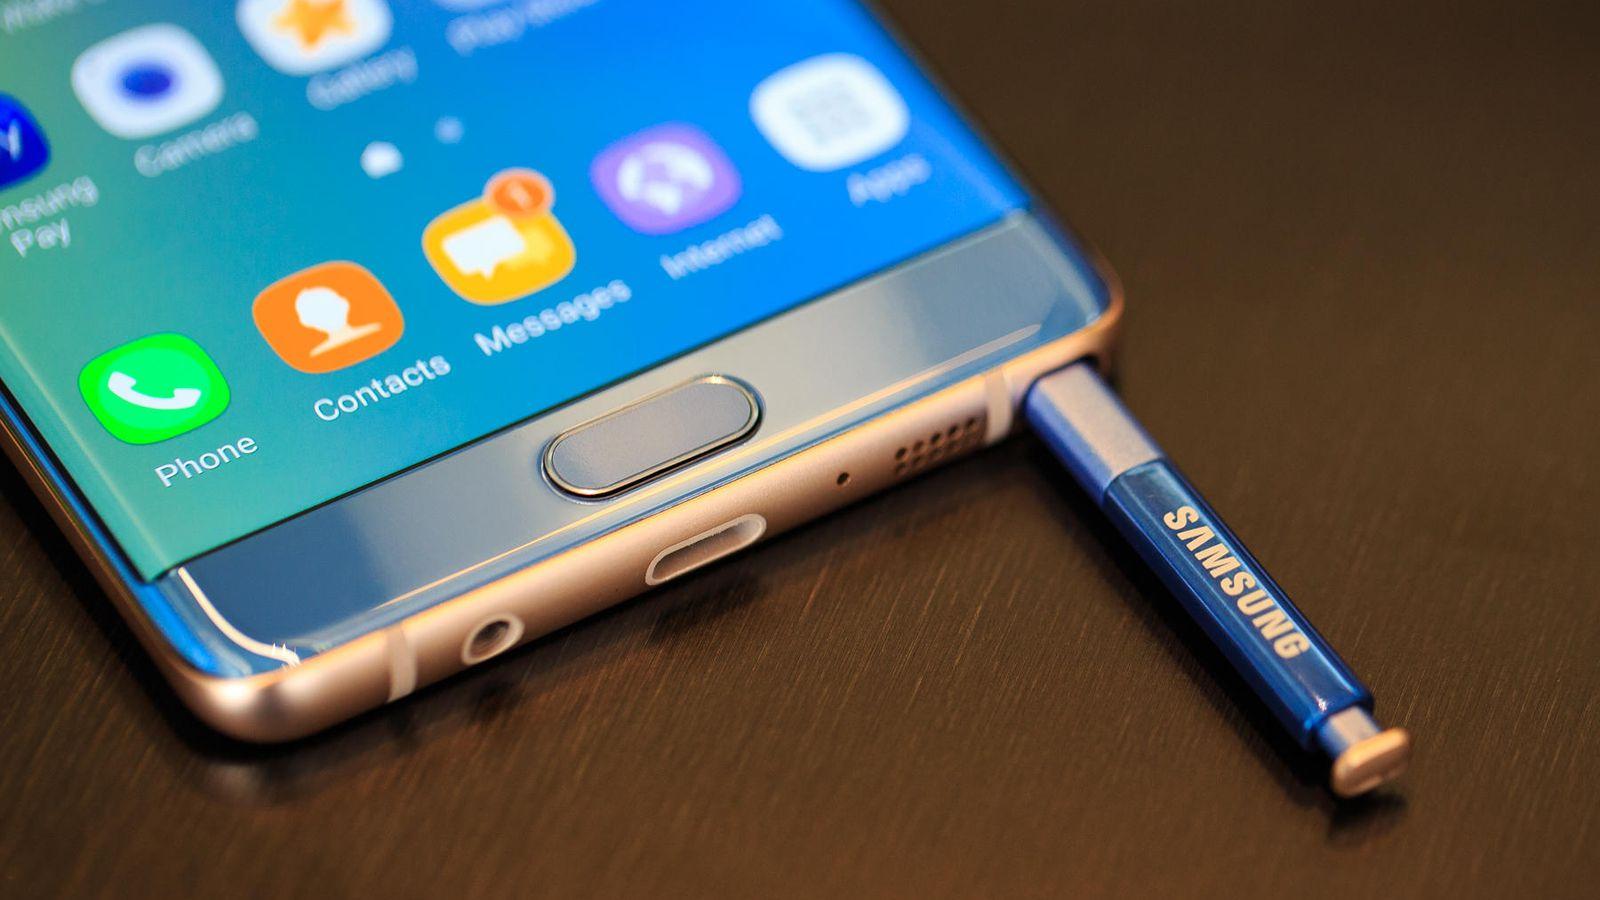 Samsung Galaxy Note 8 – cum gestionezi problemele legate de ecran, baterie și stocare?